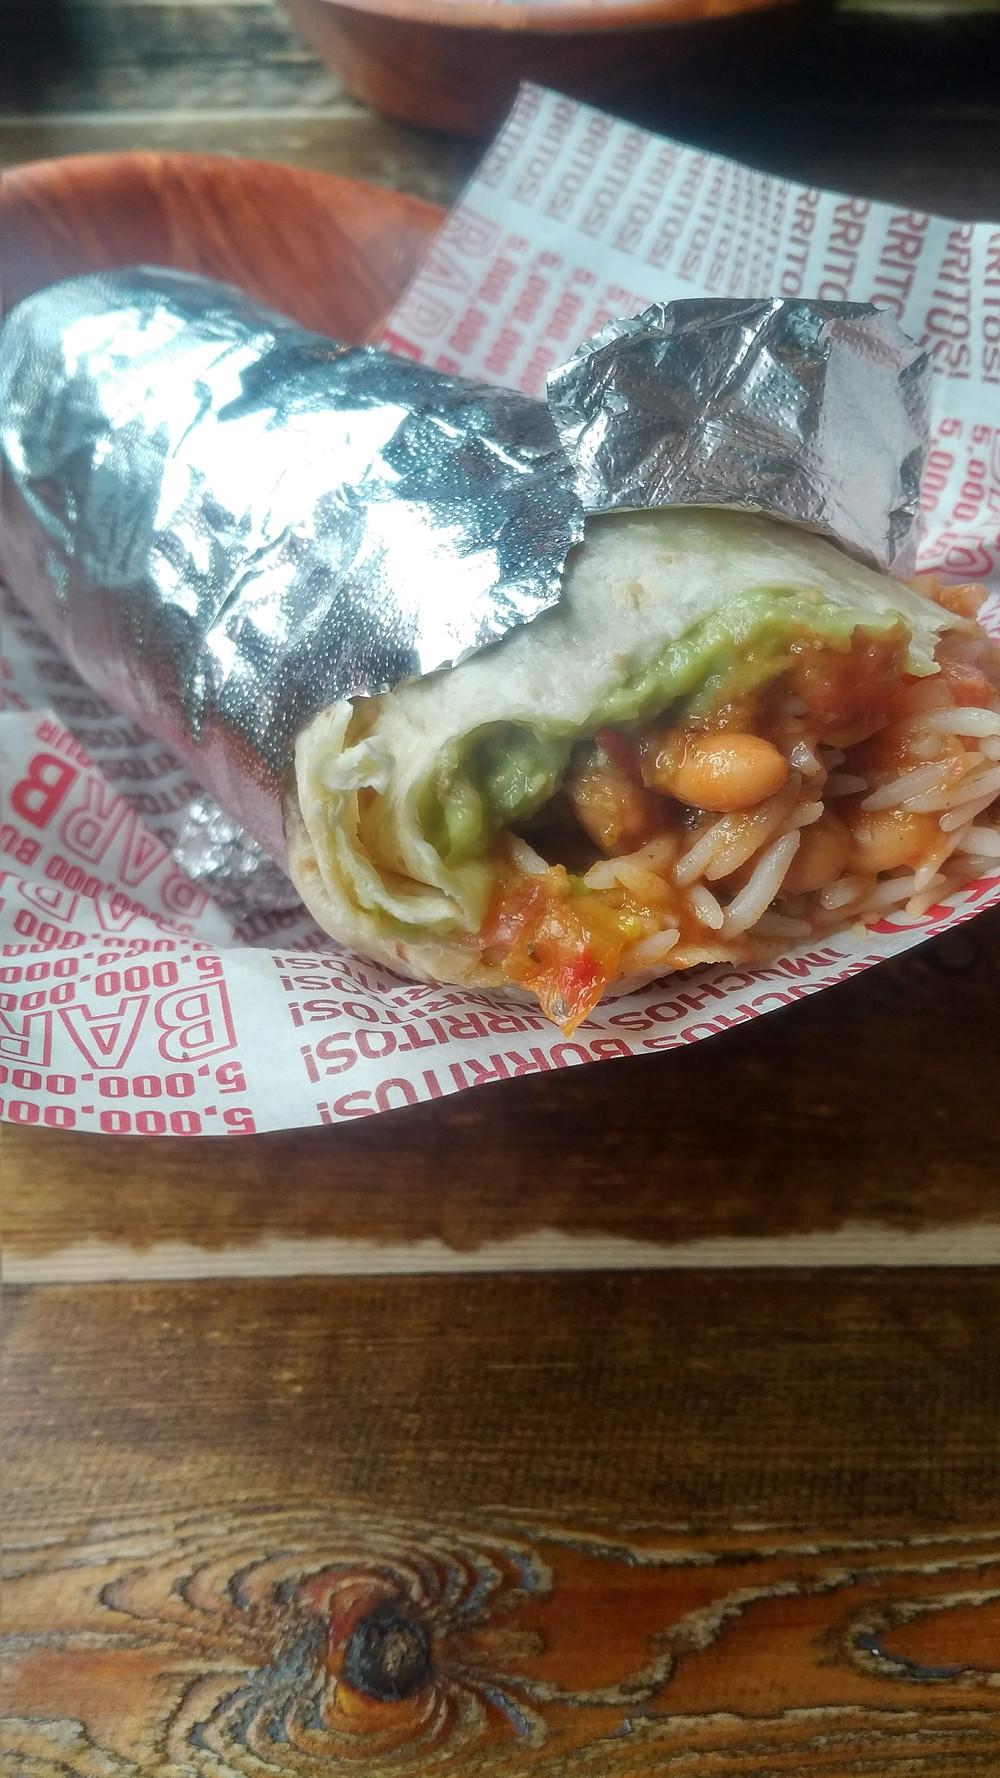 A vegan burrito wrapped in foil from Bar Burrito